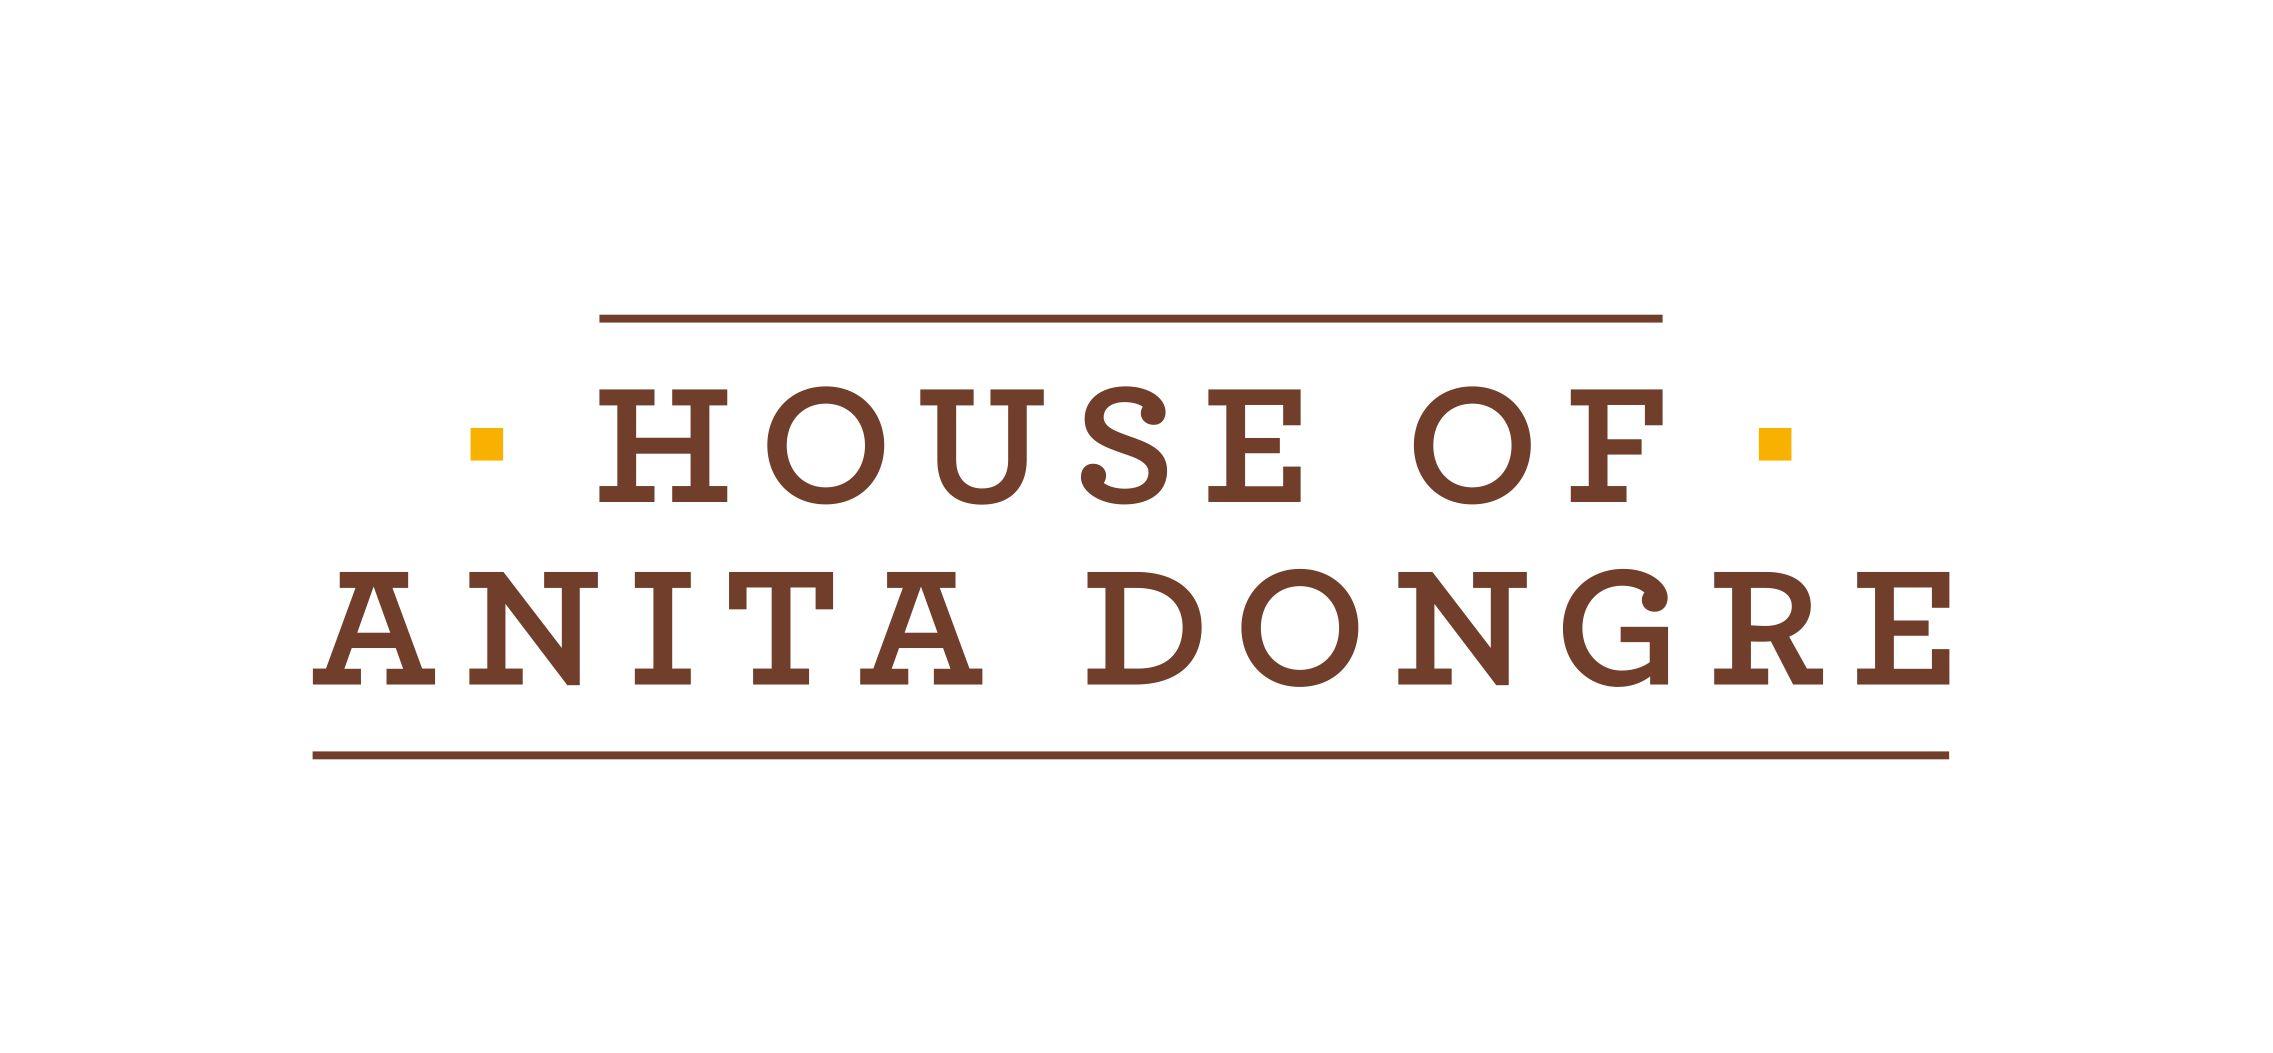 House of Anita Dongre Ltd